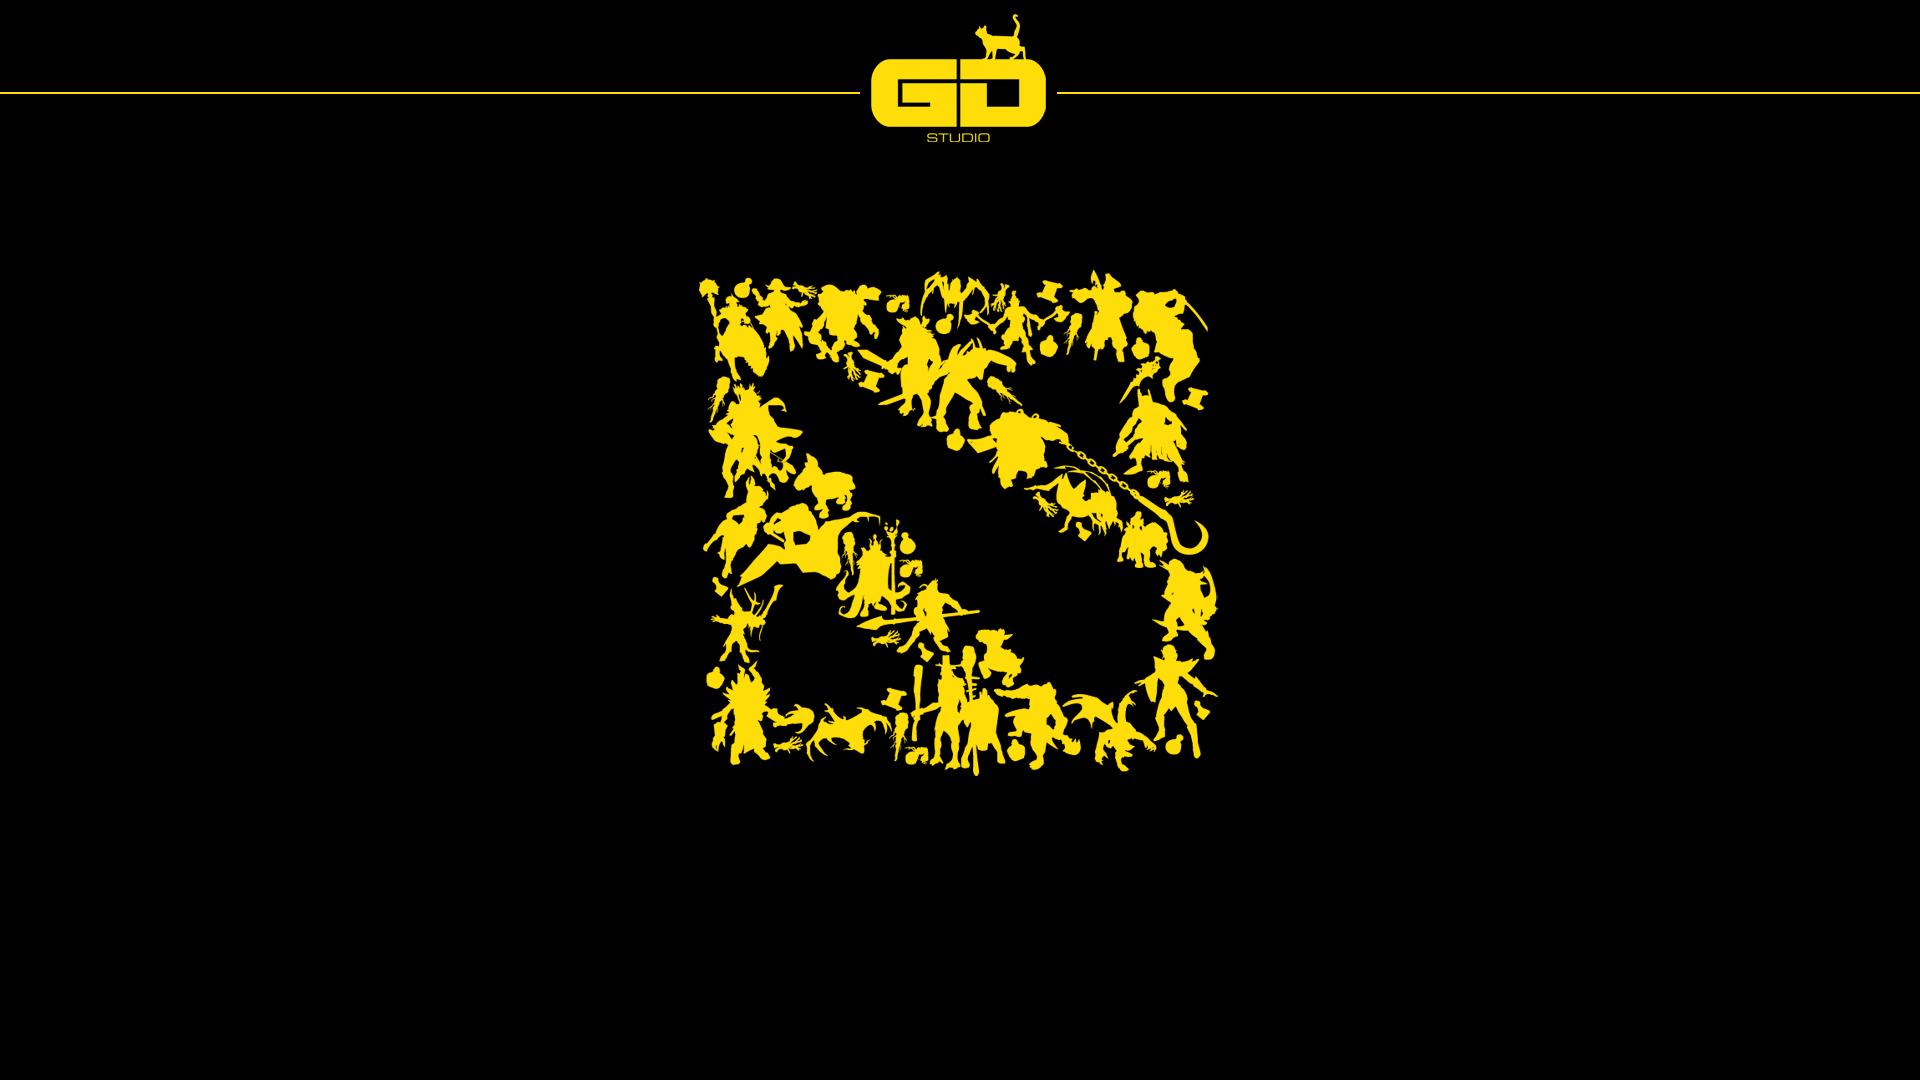 Dota 2 Silhouette Logo Wallpaper Digital Wallpaper Dota 2 Dota 2 Logo